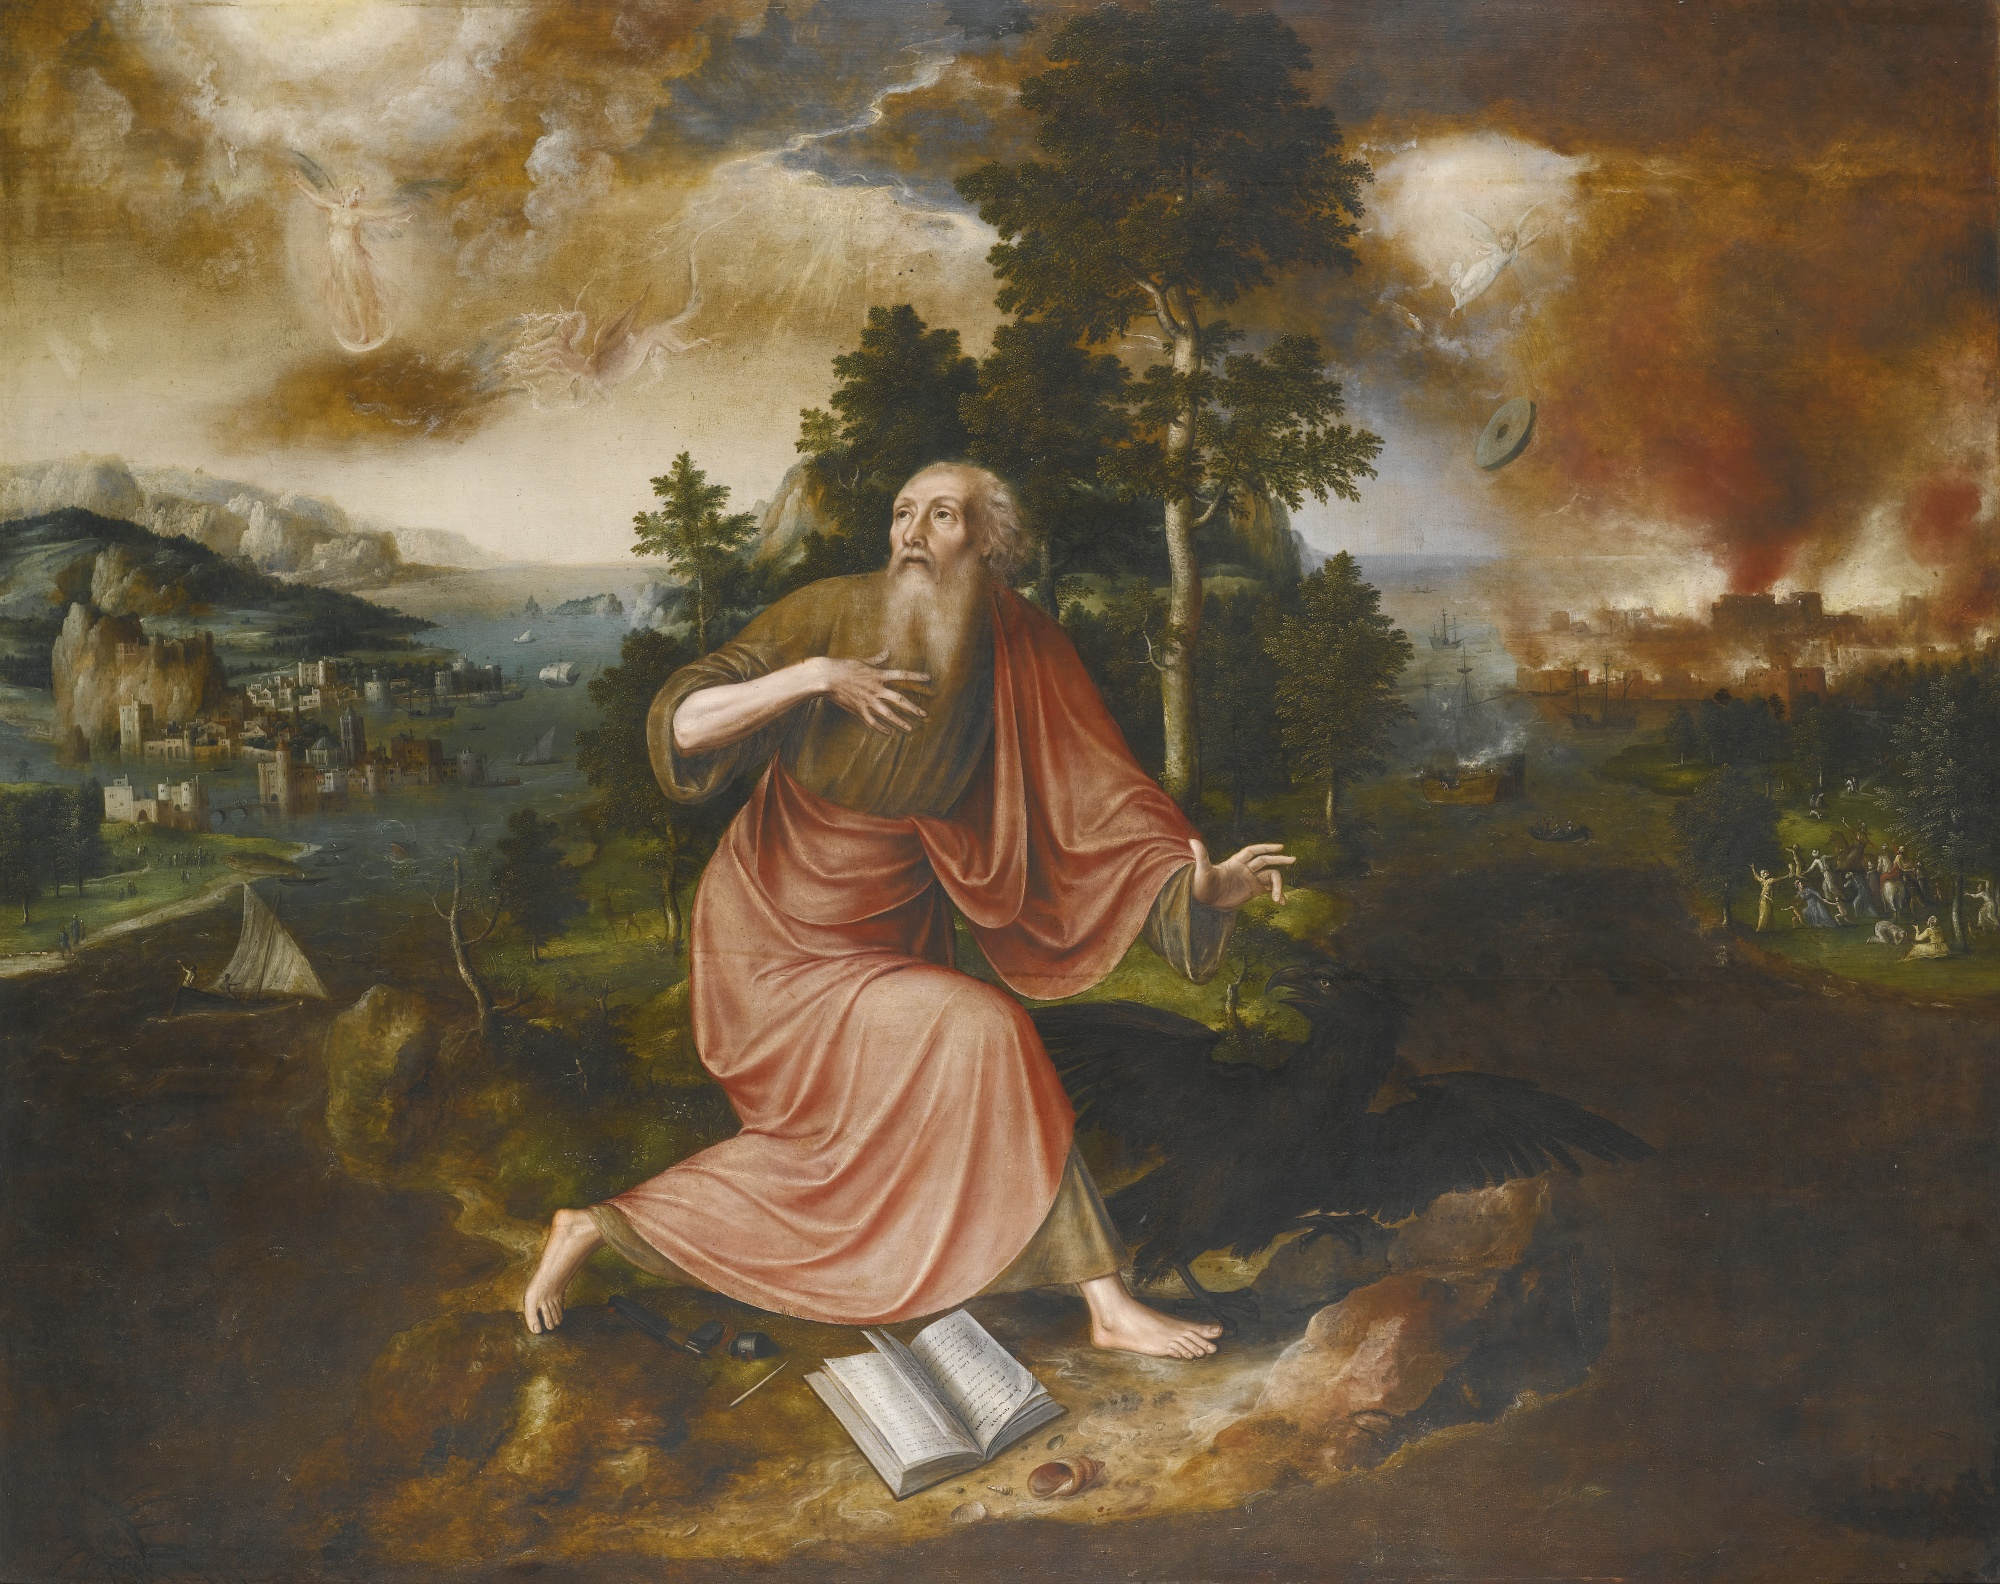 Jan_Massijs_-_The_Apocalypse_of_Saint_John_the_Evangelist_(1563).jpg